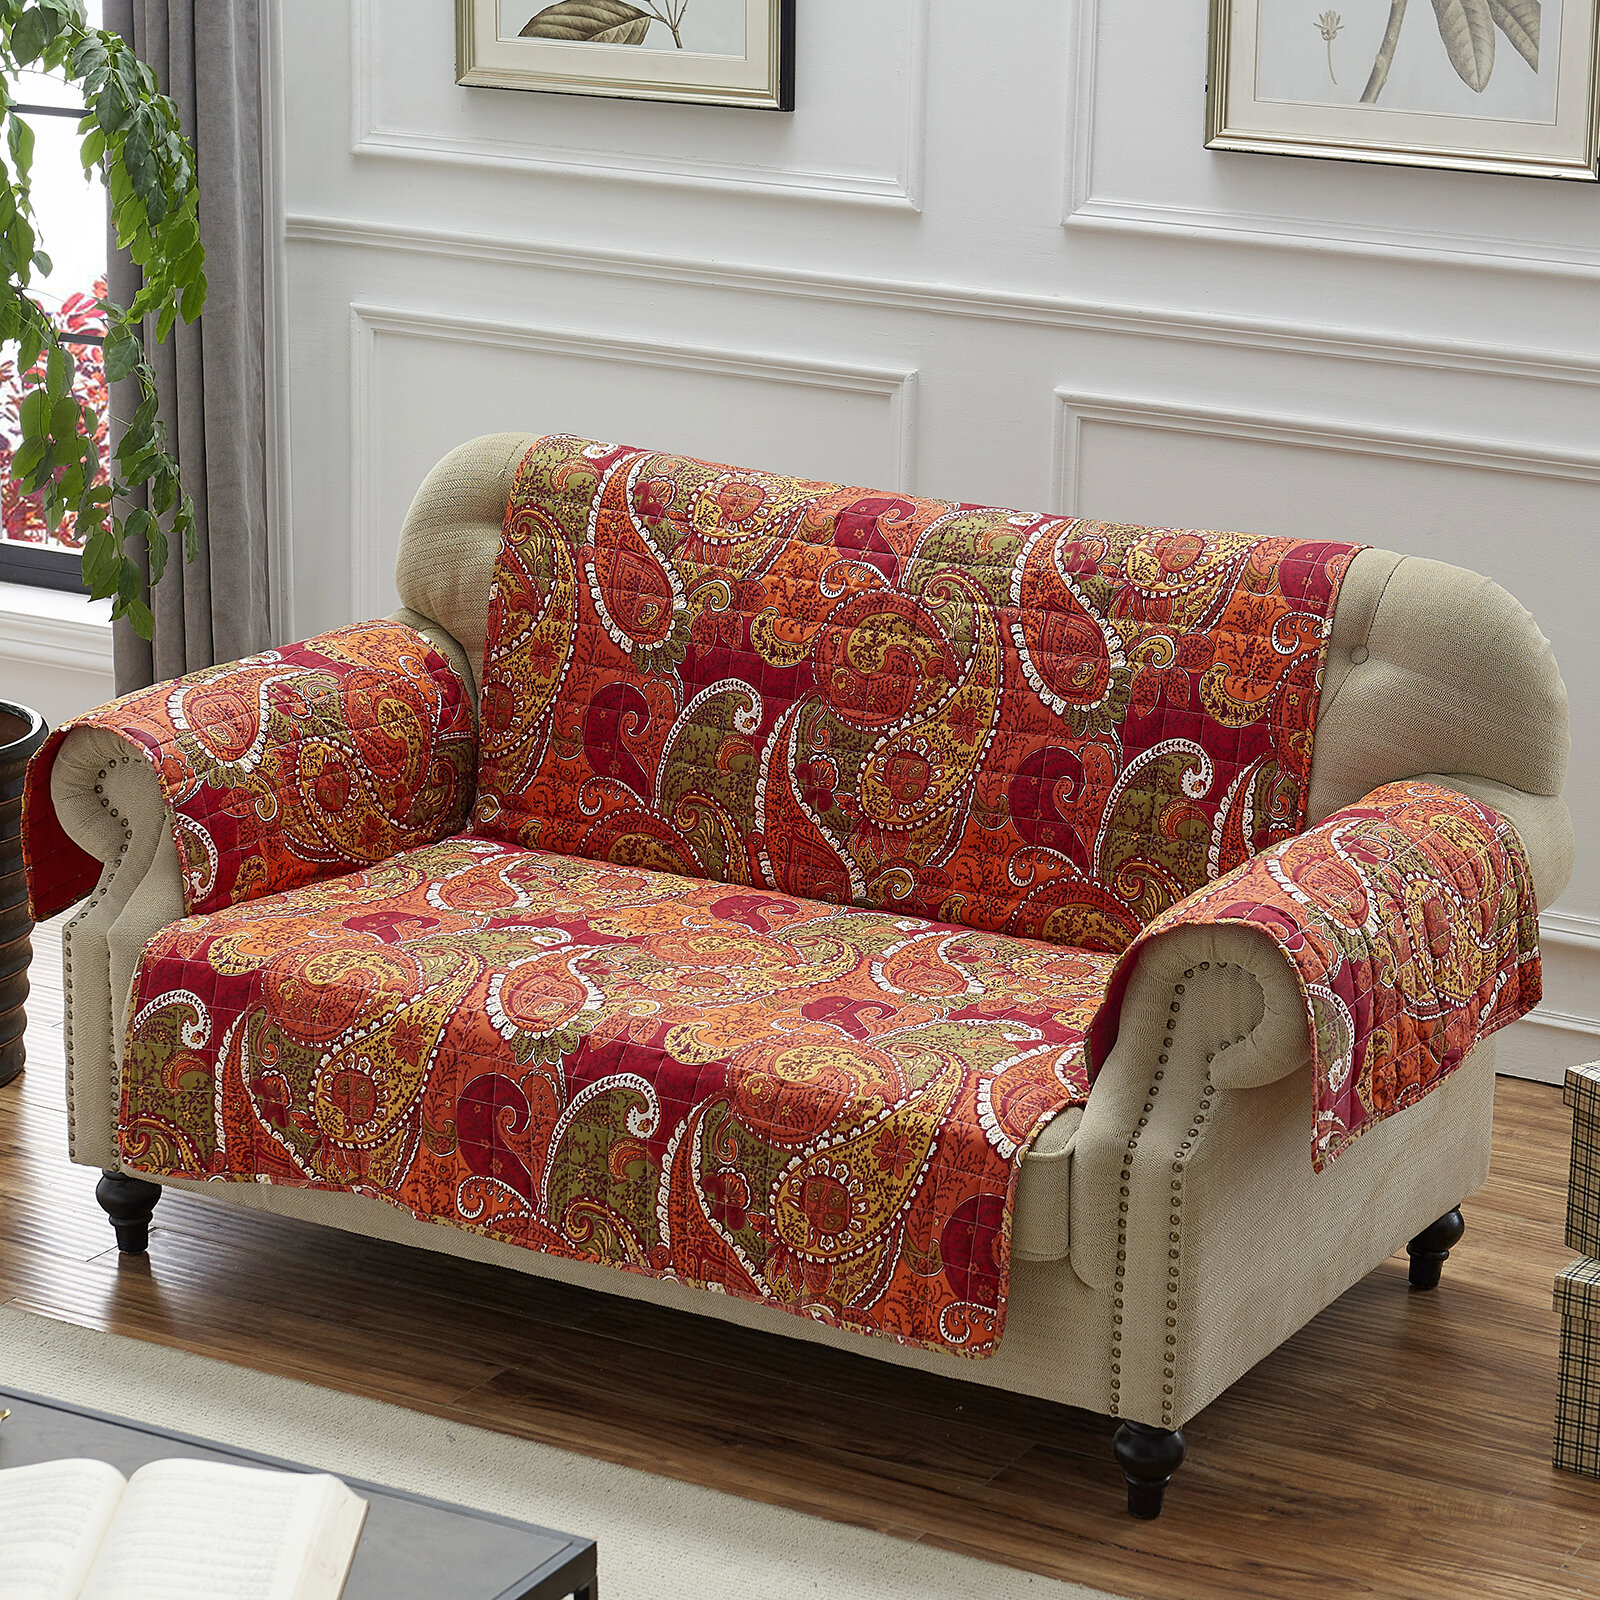 Fantastic Sayler Box Cushion Loveseat Slipcover Machost Co Dining Chair Design Ideas Machostcouk